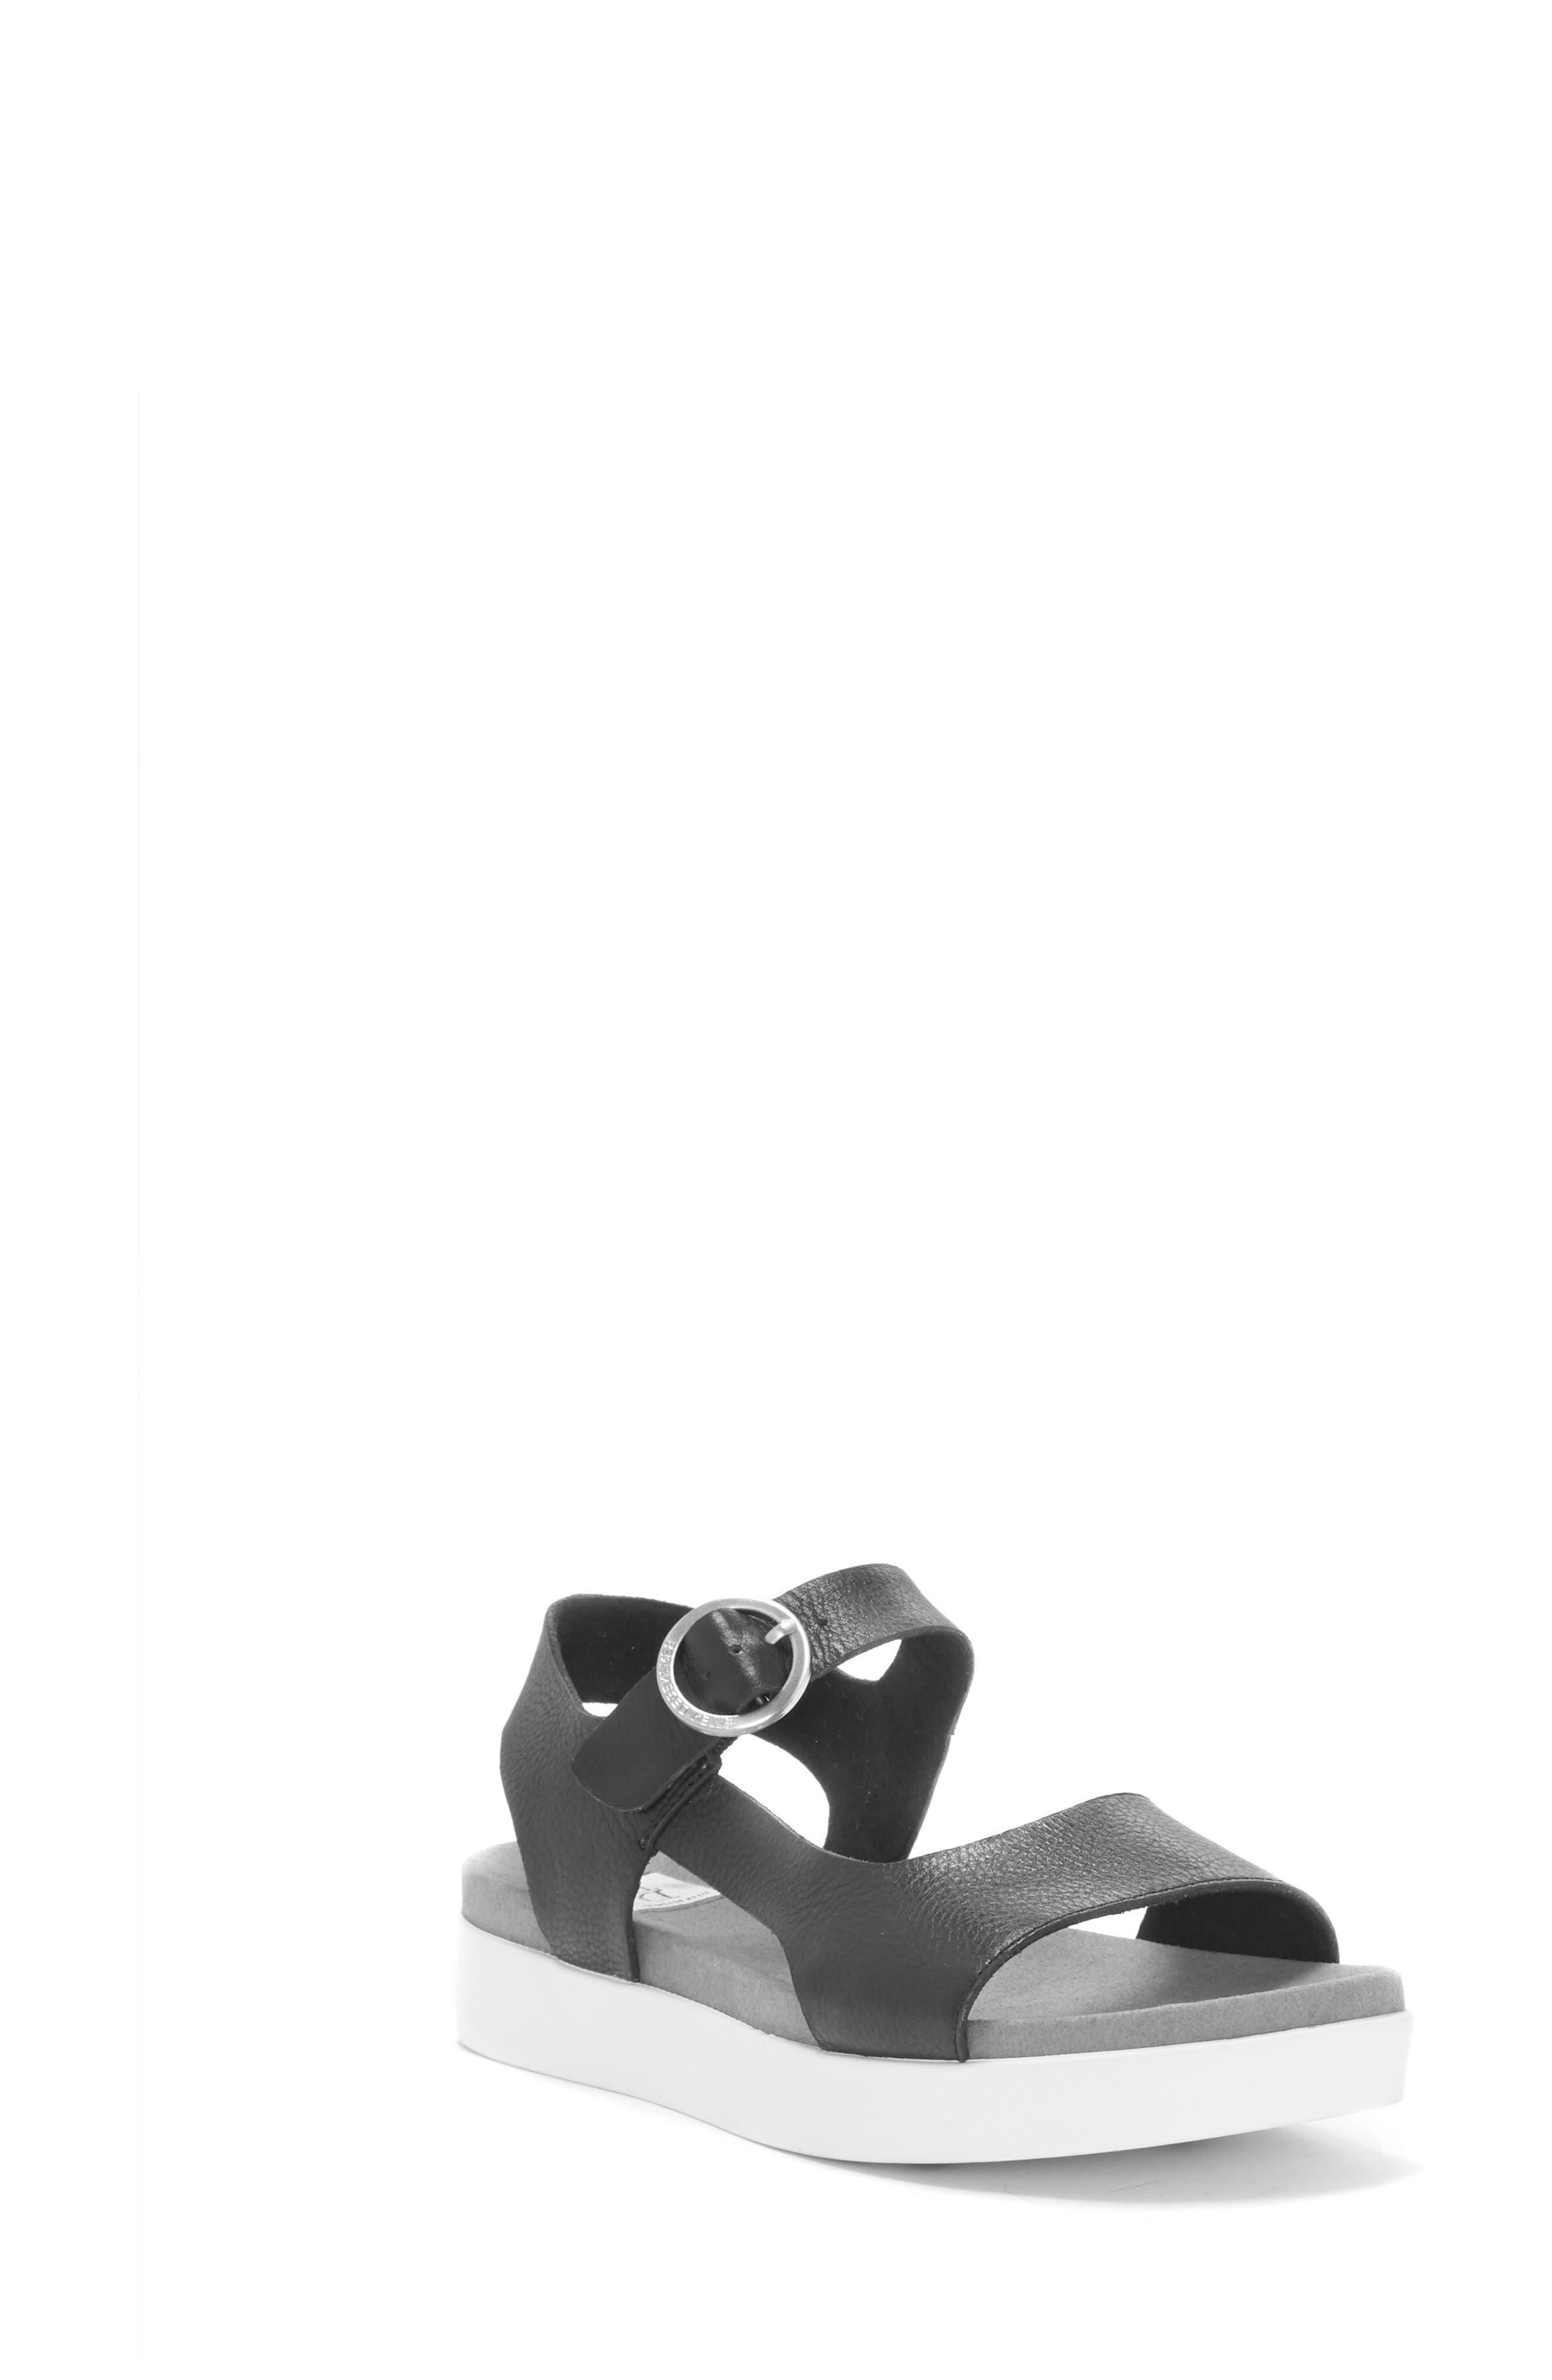 Caspin Sandal,                             Main thumbnail 1, color,                             002